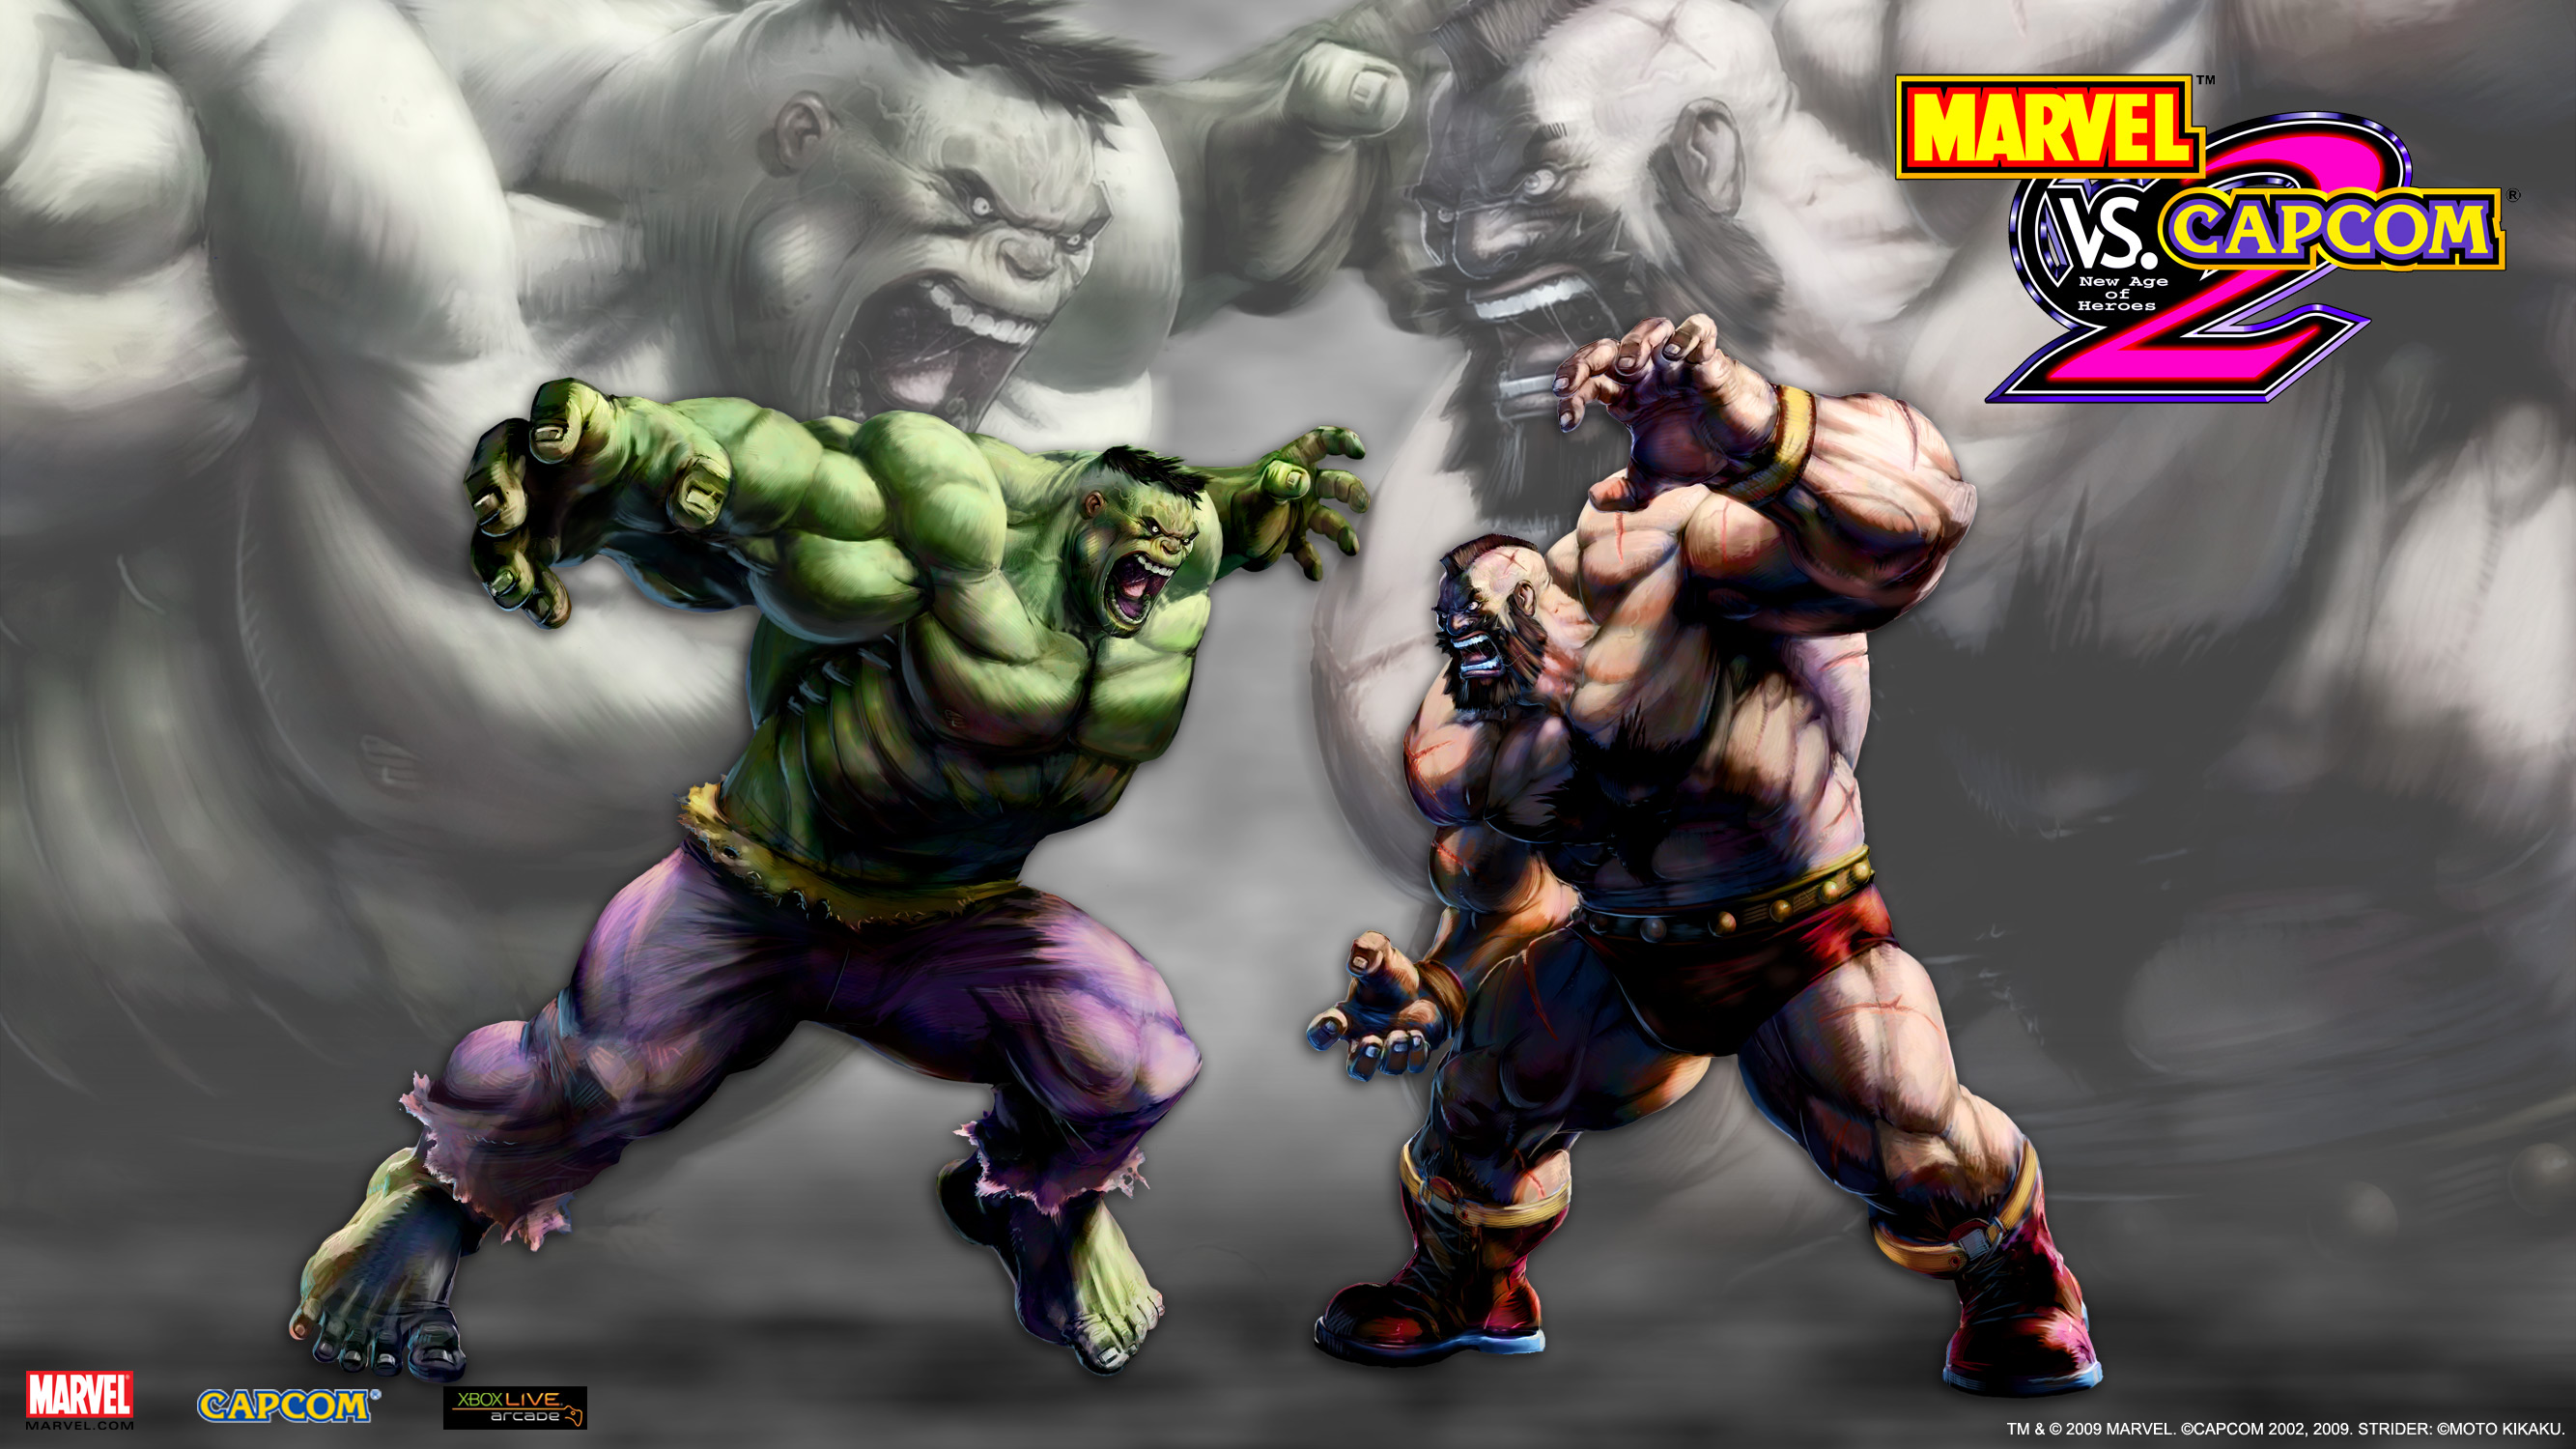 Fantastic Wallpaper Marvel The Incredible Hulk - latest?cb\u003d20101219092819  Snapshot_187549.jpg/revision/latest?cb\u003d20101219092819